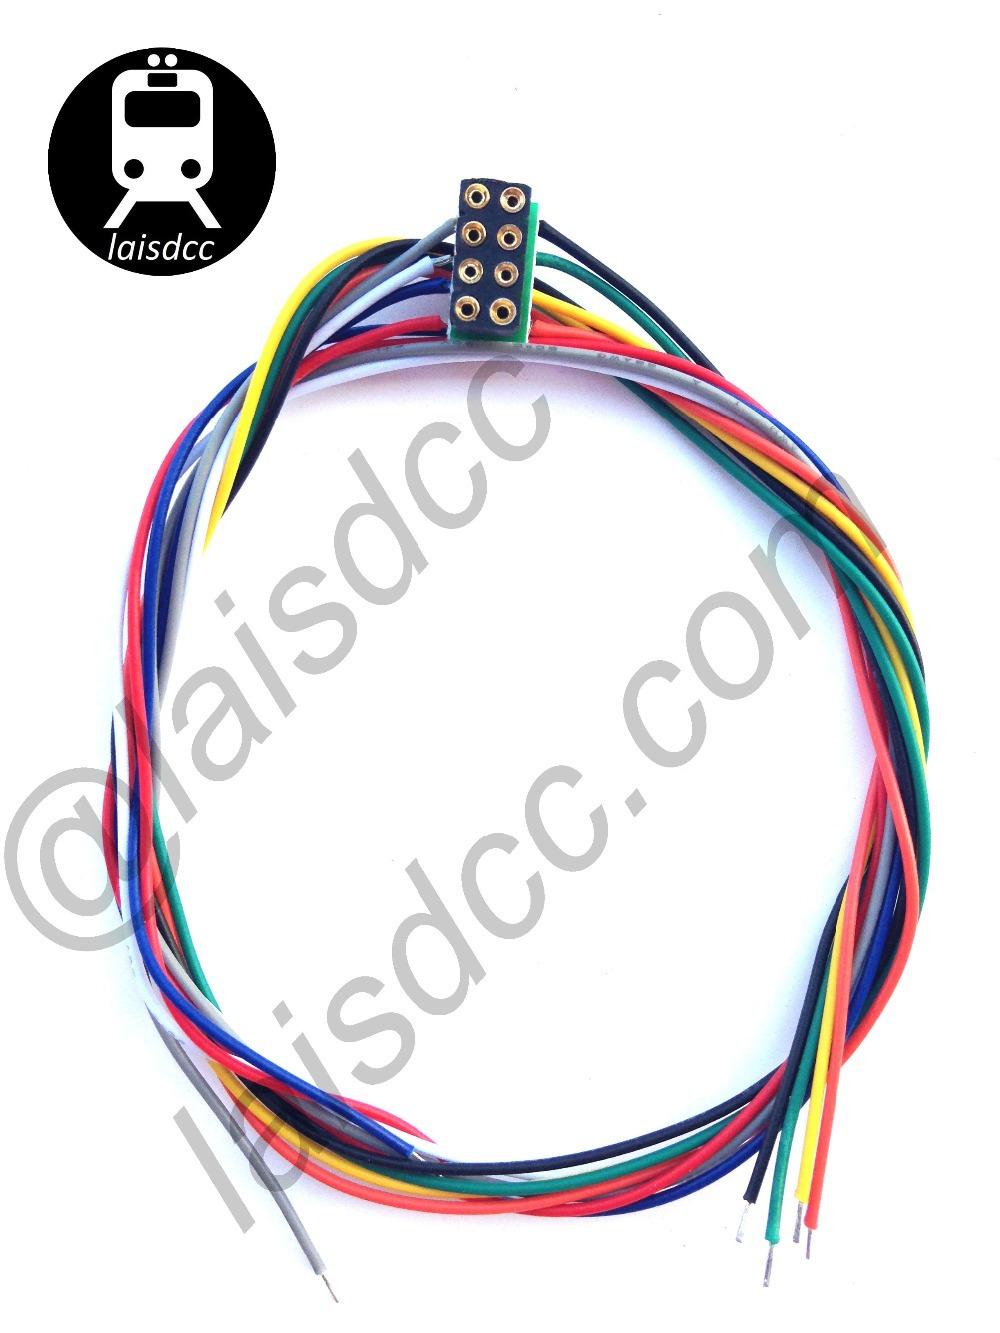 8 PIN DCC decodificador enchufes NEM 652 WITH con cable HARNESS / laisdcc(China (Mainland))